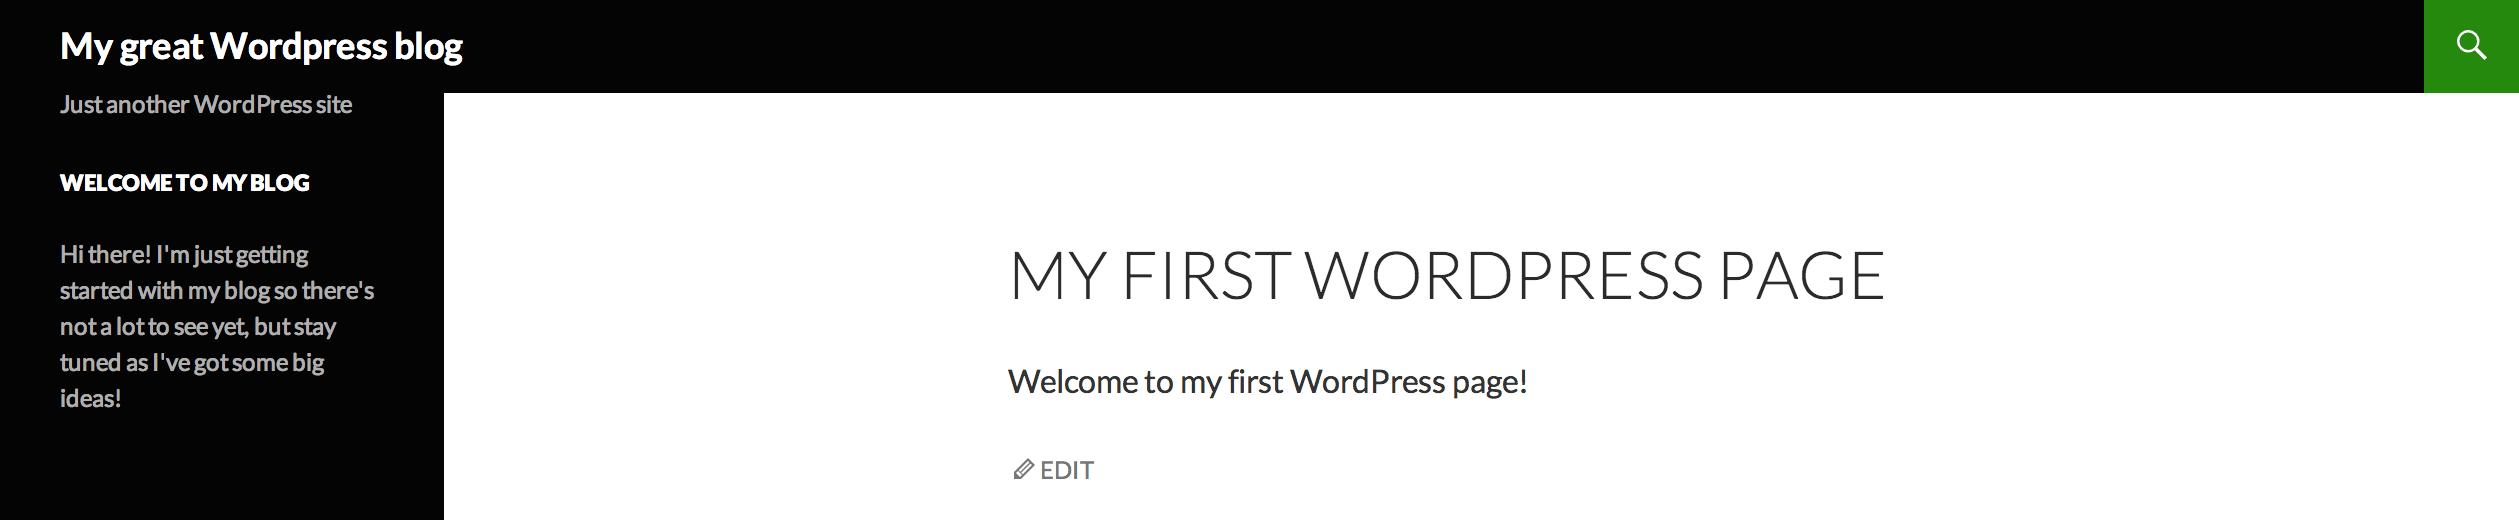 My First WordPress Page